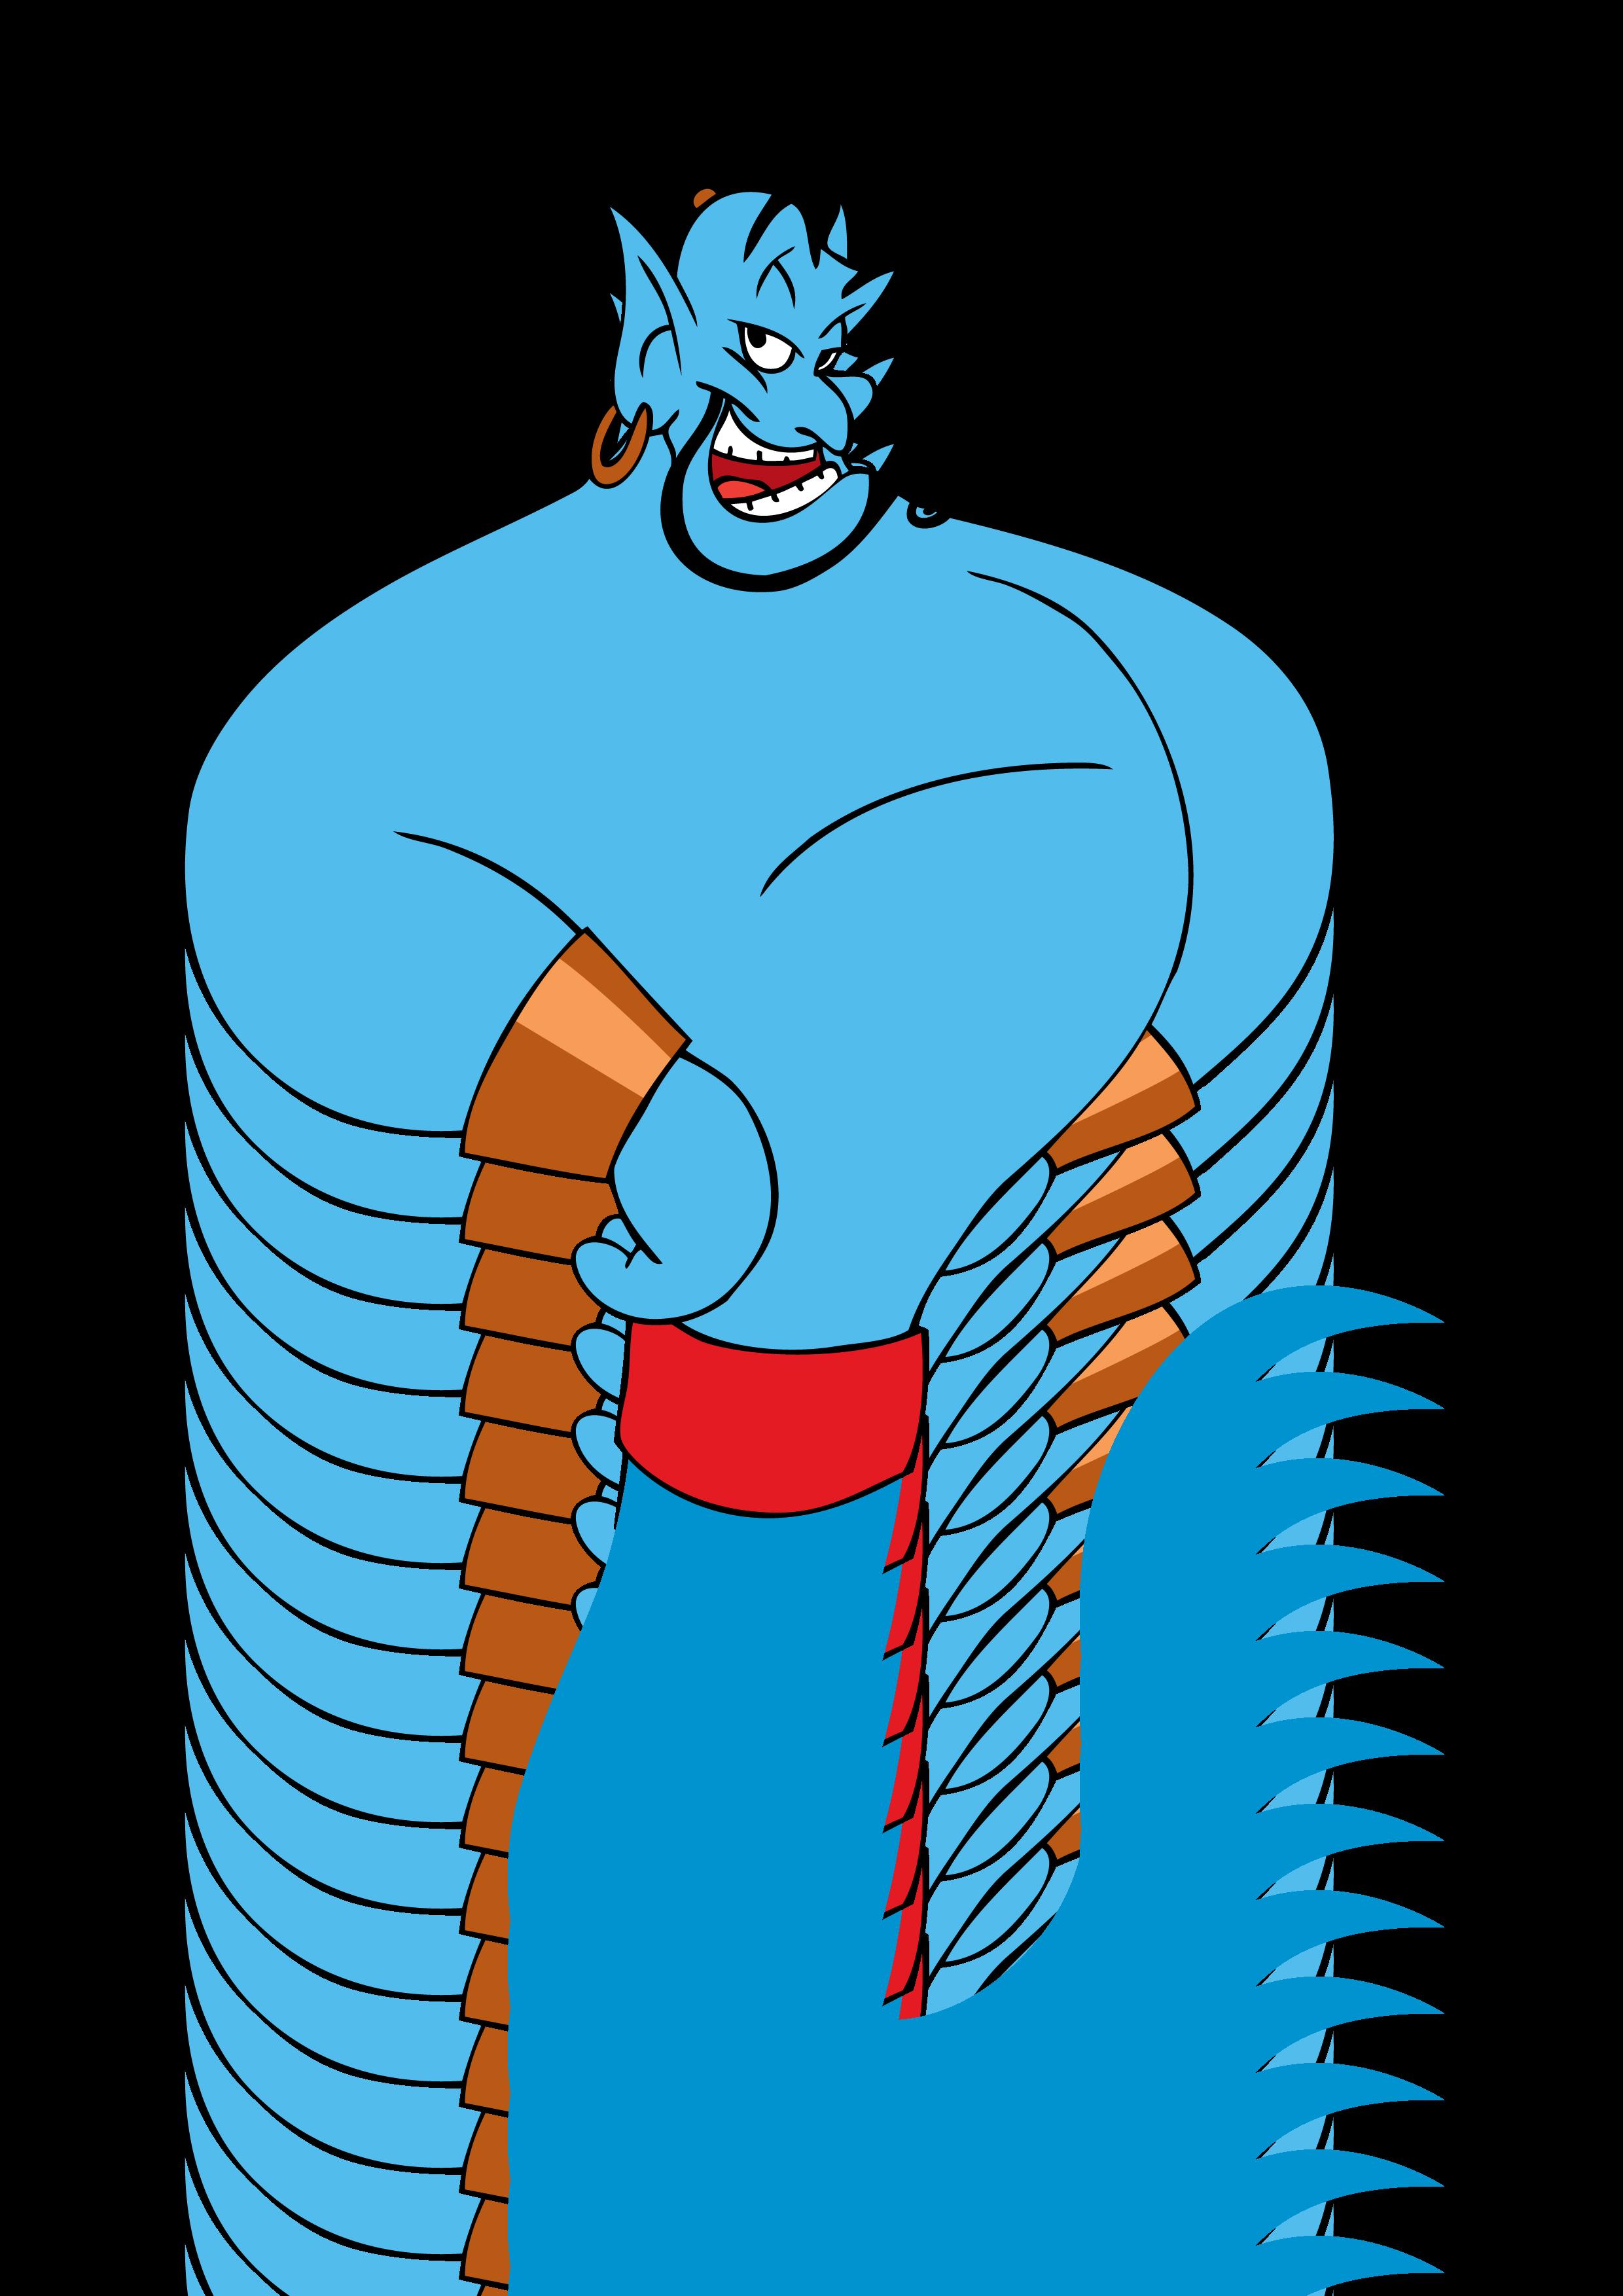 Disney Aladdin Clipart at GetDrawings.com.